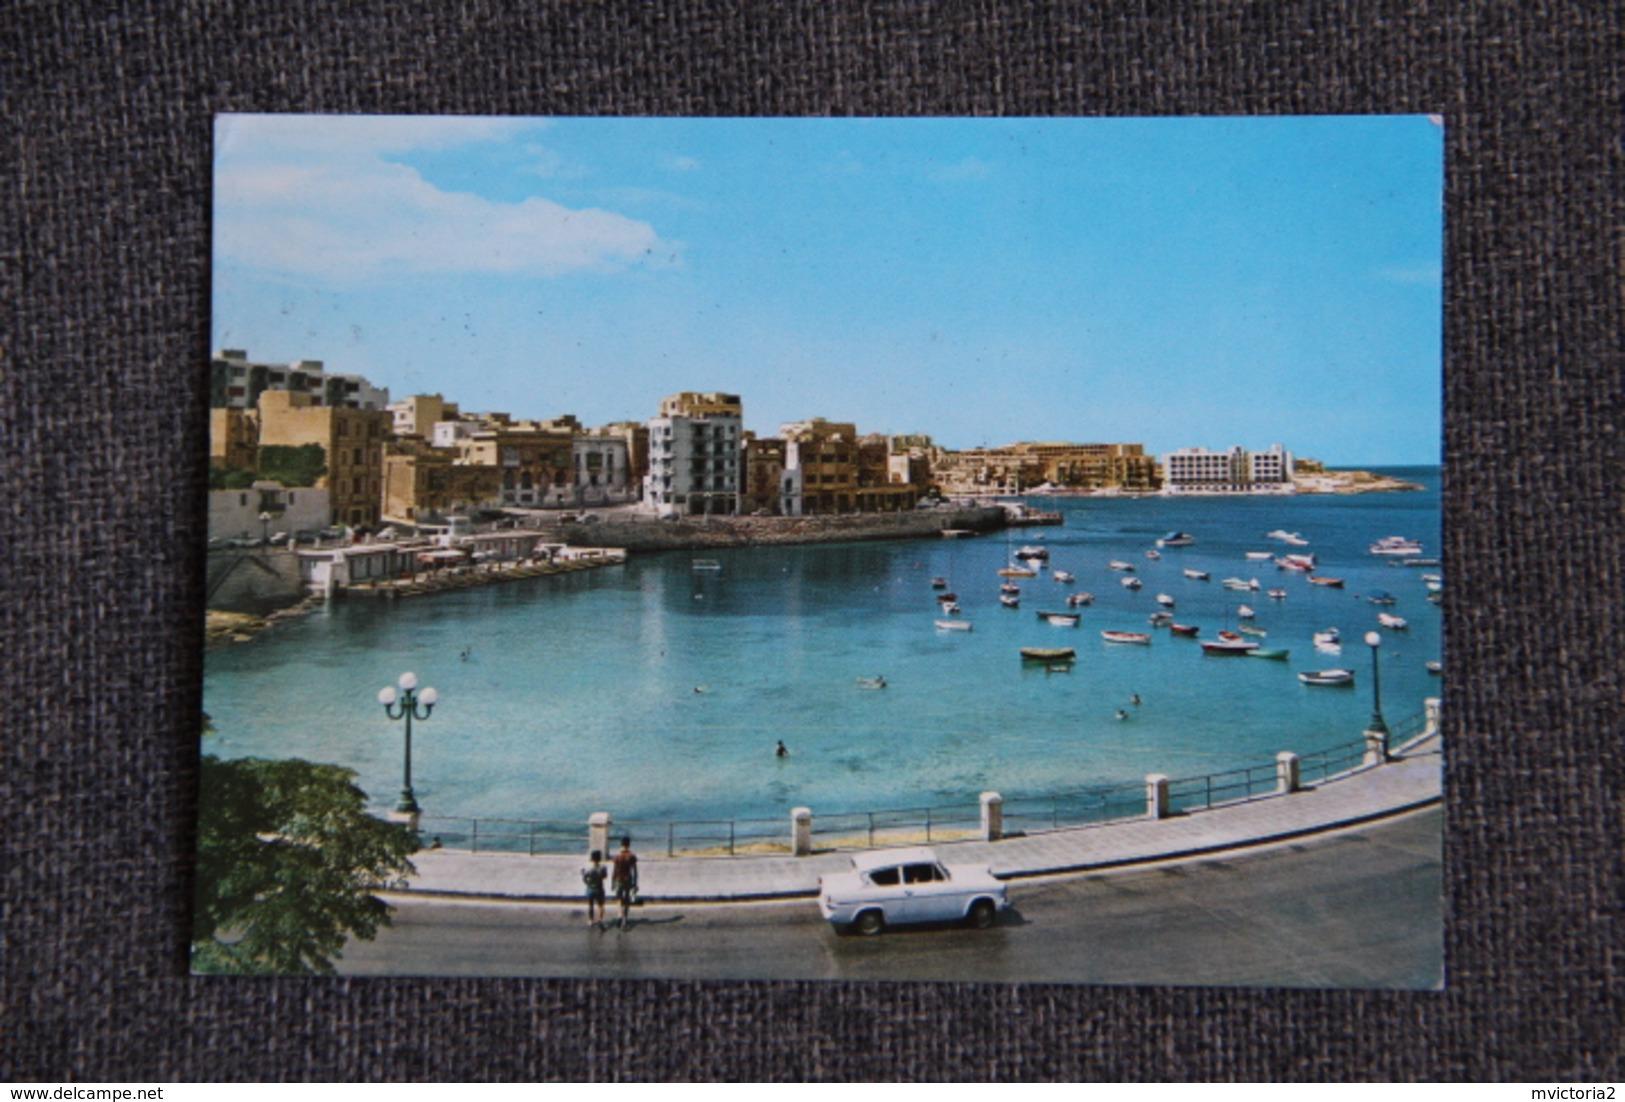 MALTA - Balluta Bay, St Julians. - Malte